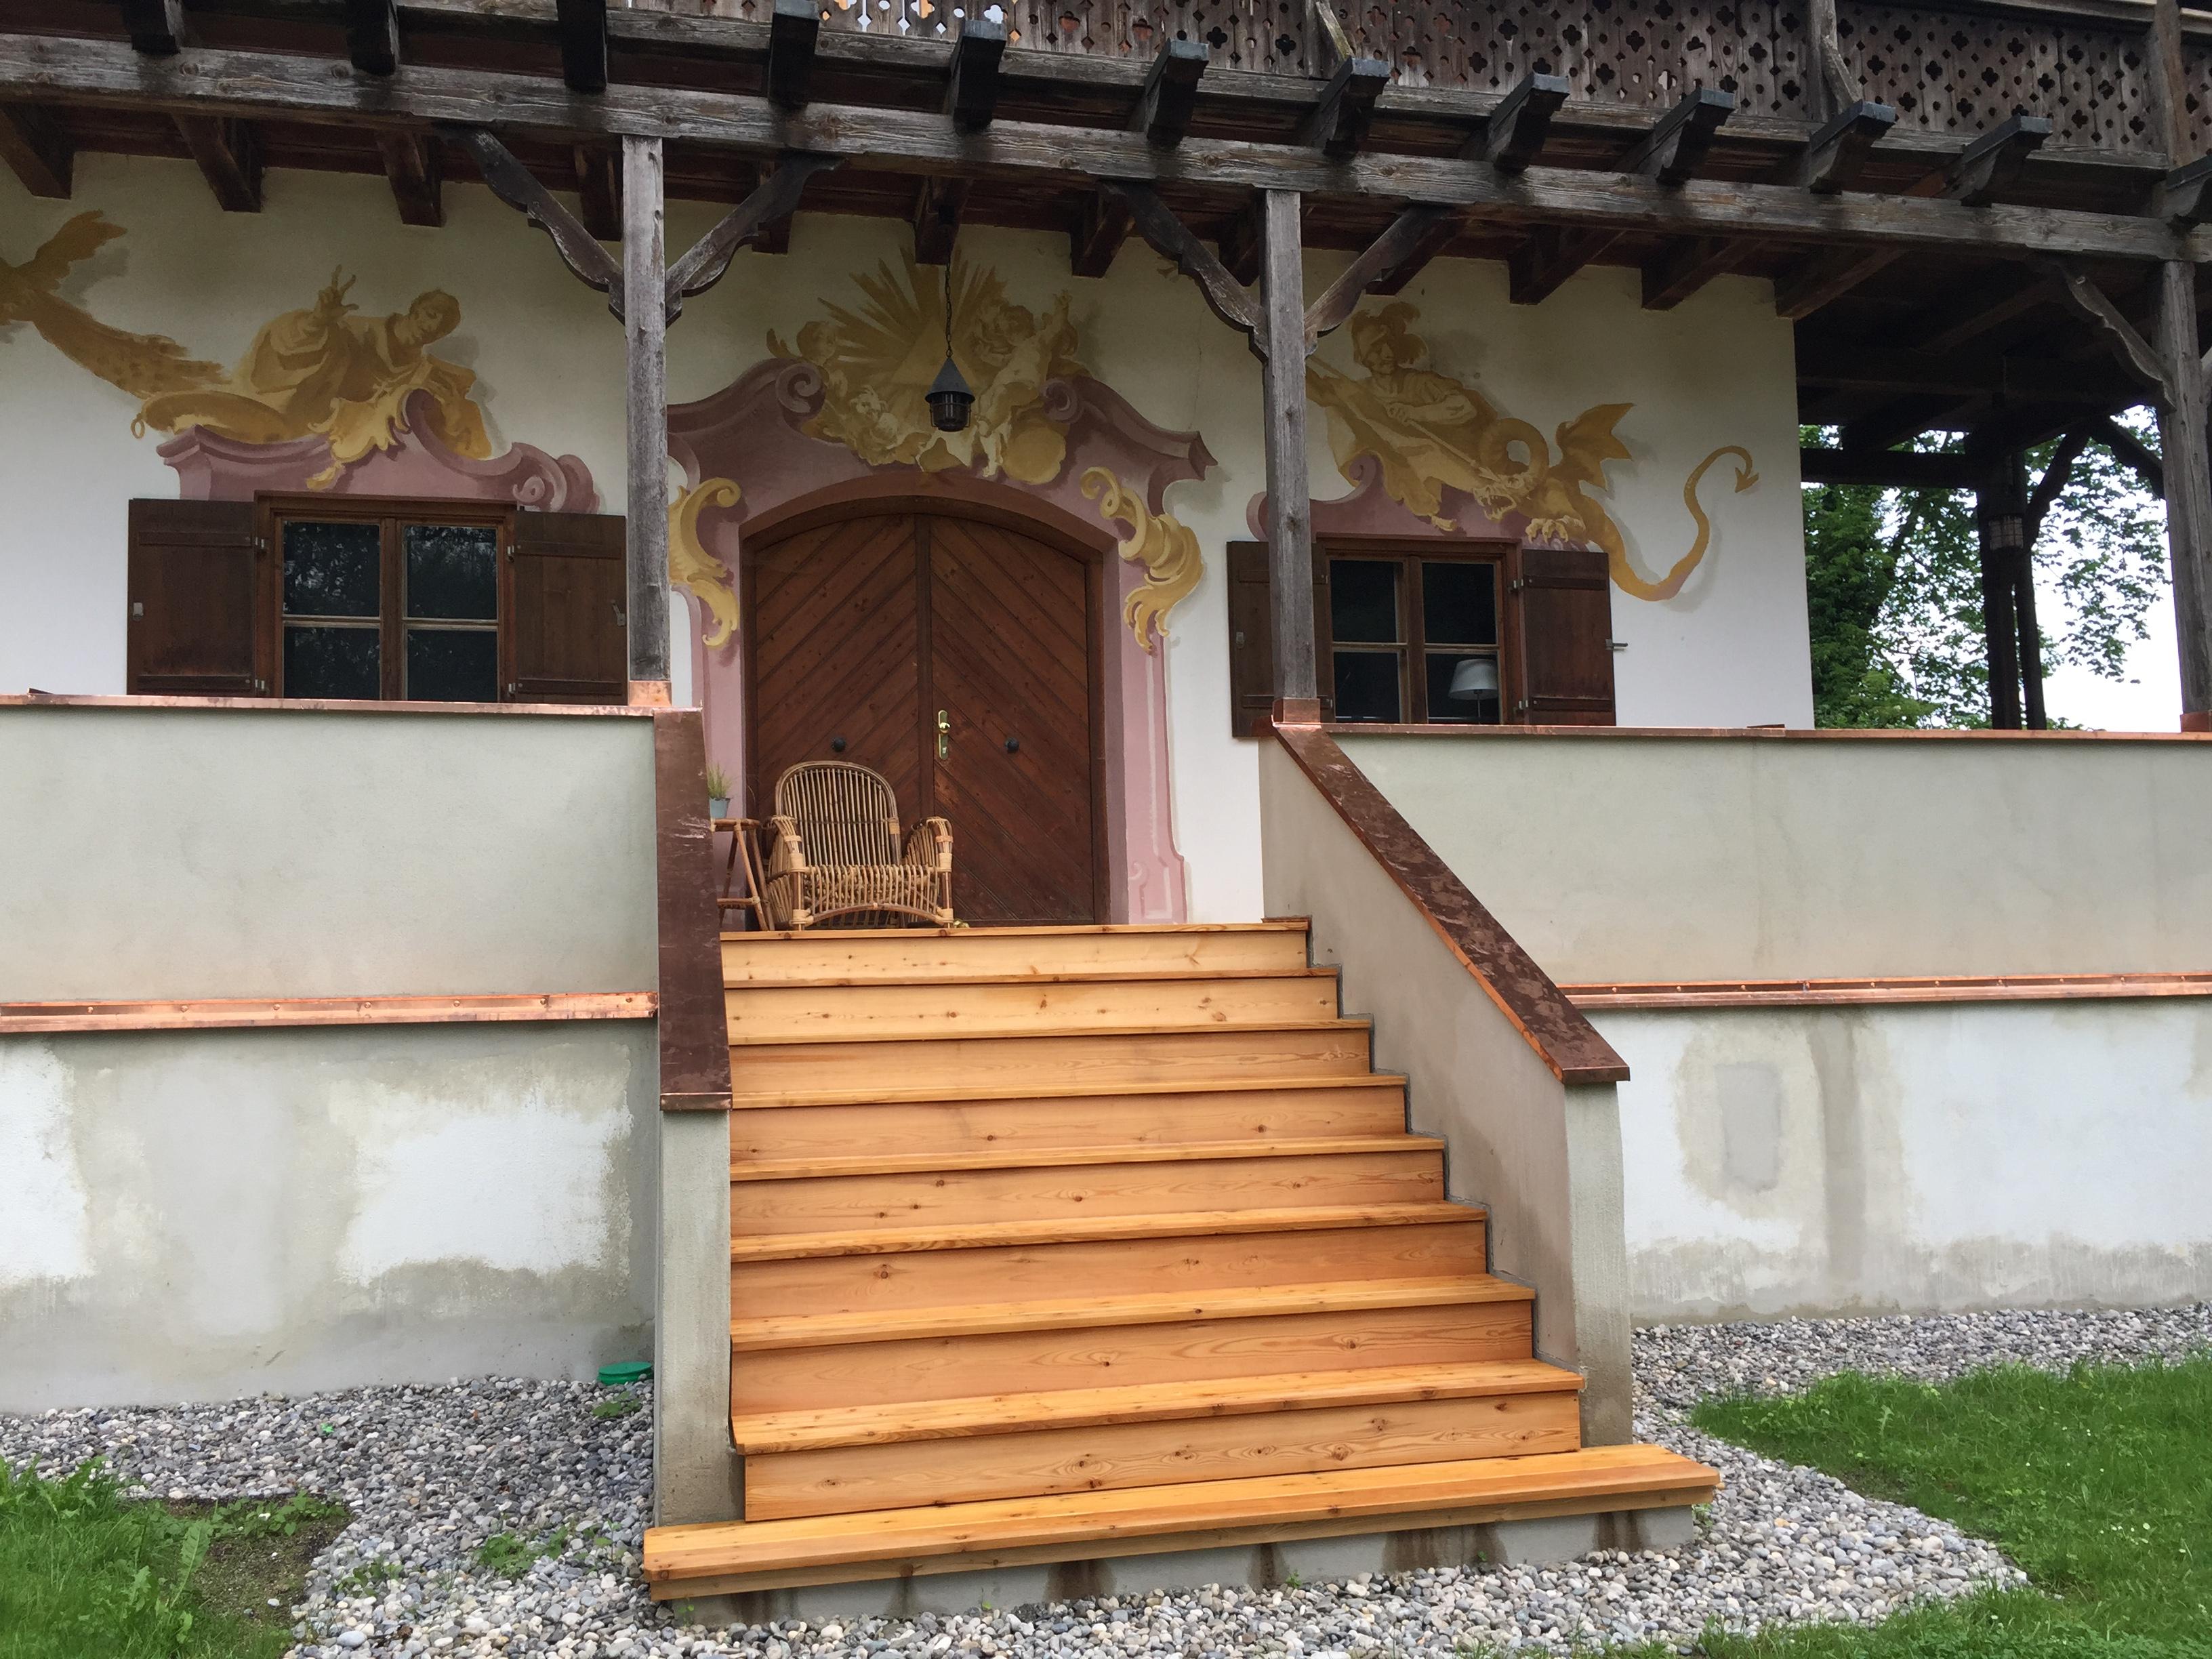 Eingangstreppe aus Holz - Zimmerei Lenk